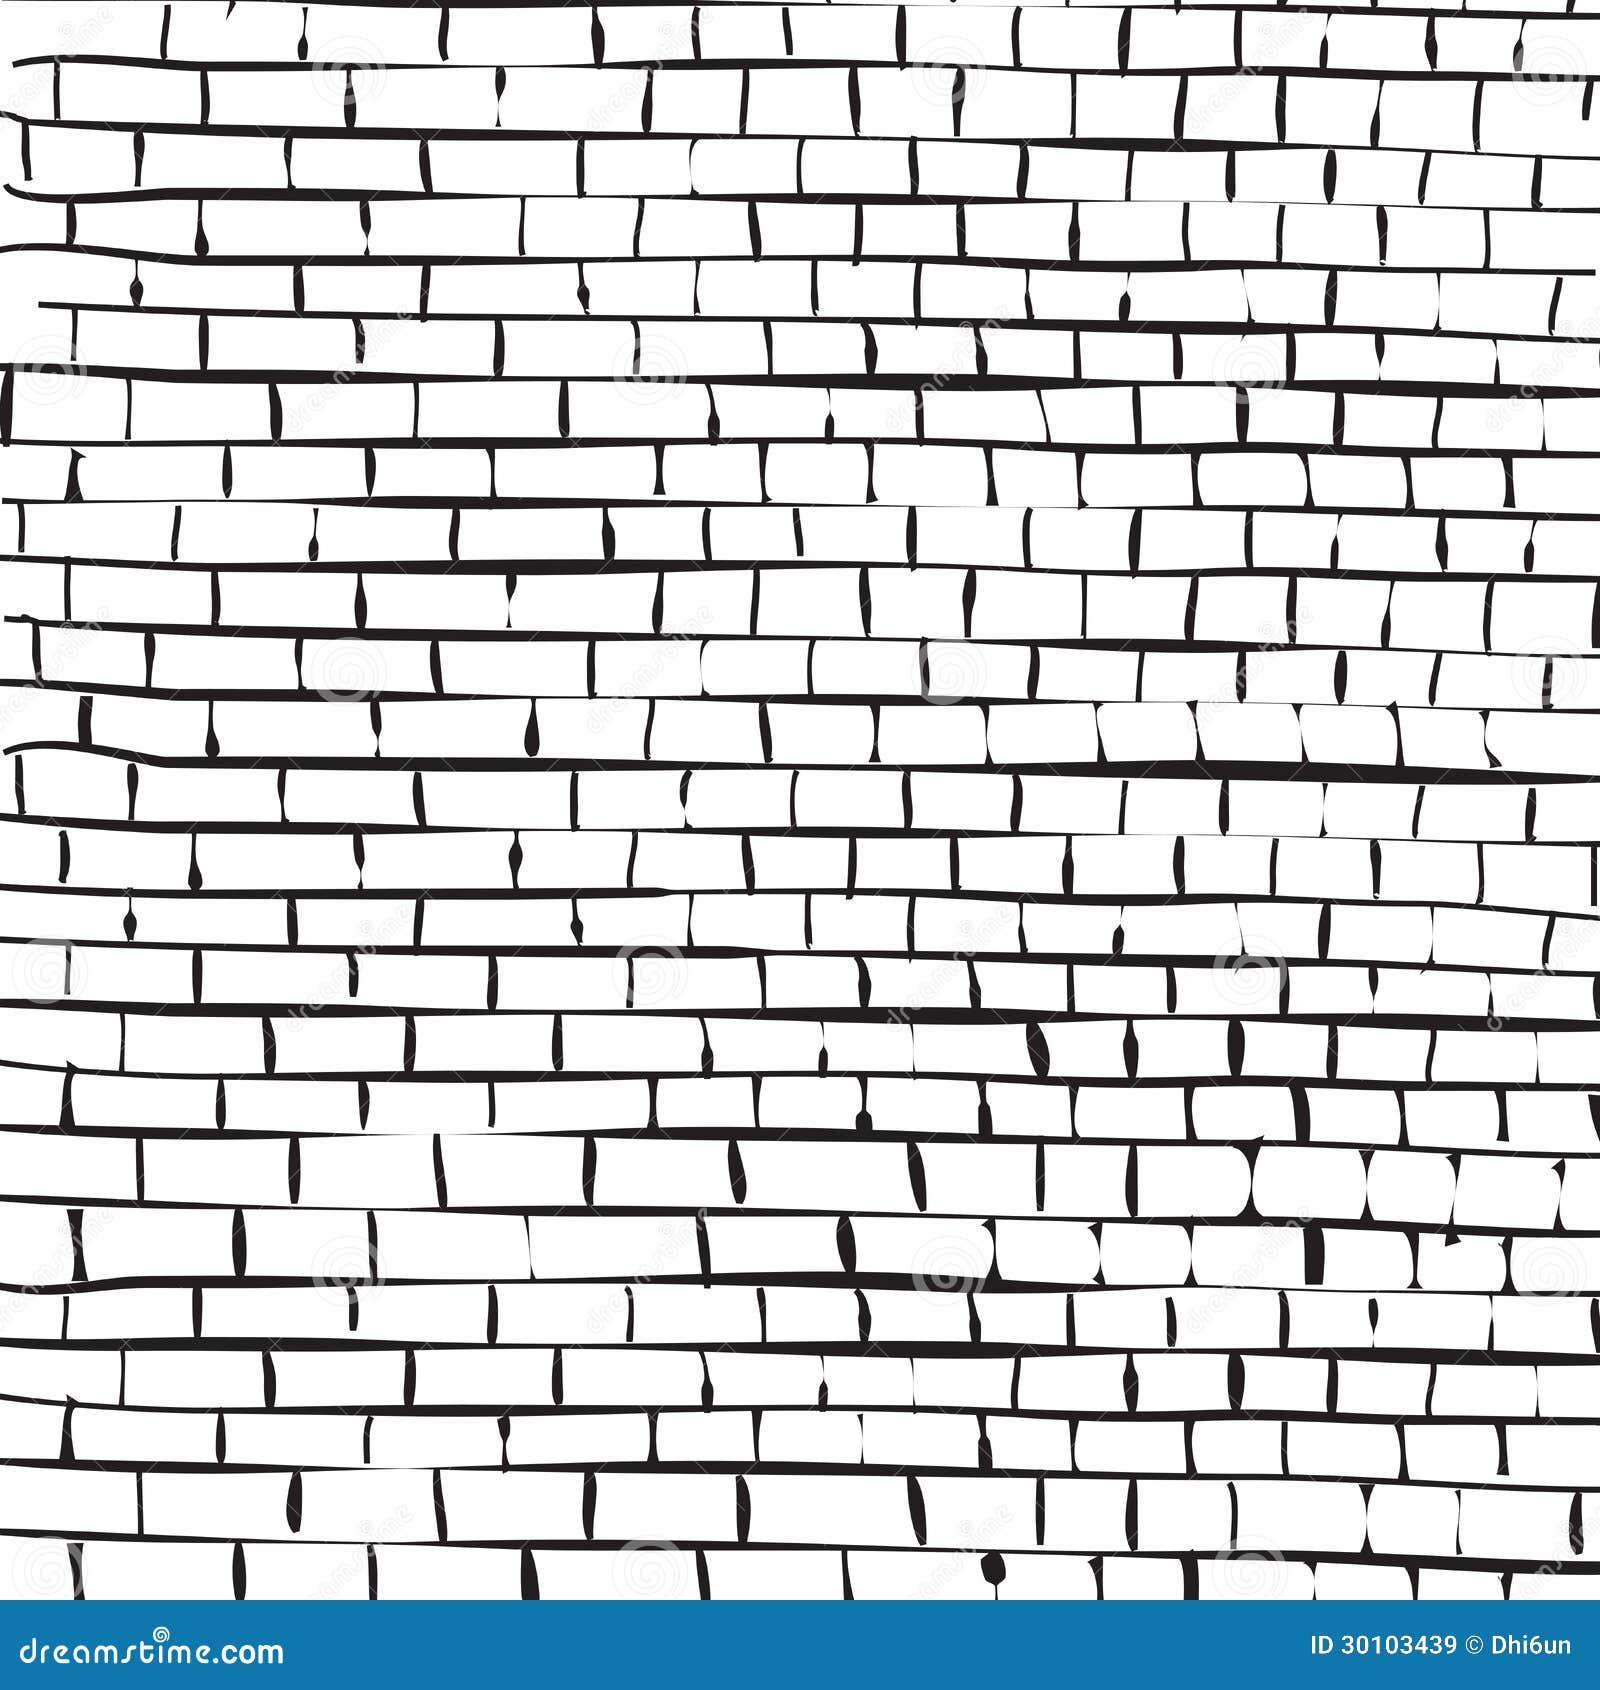 texture de mur de briques images libres de droits image 30103439. Black Bedroom Furniture Sets. Home Design Ideas